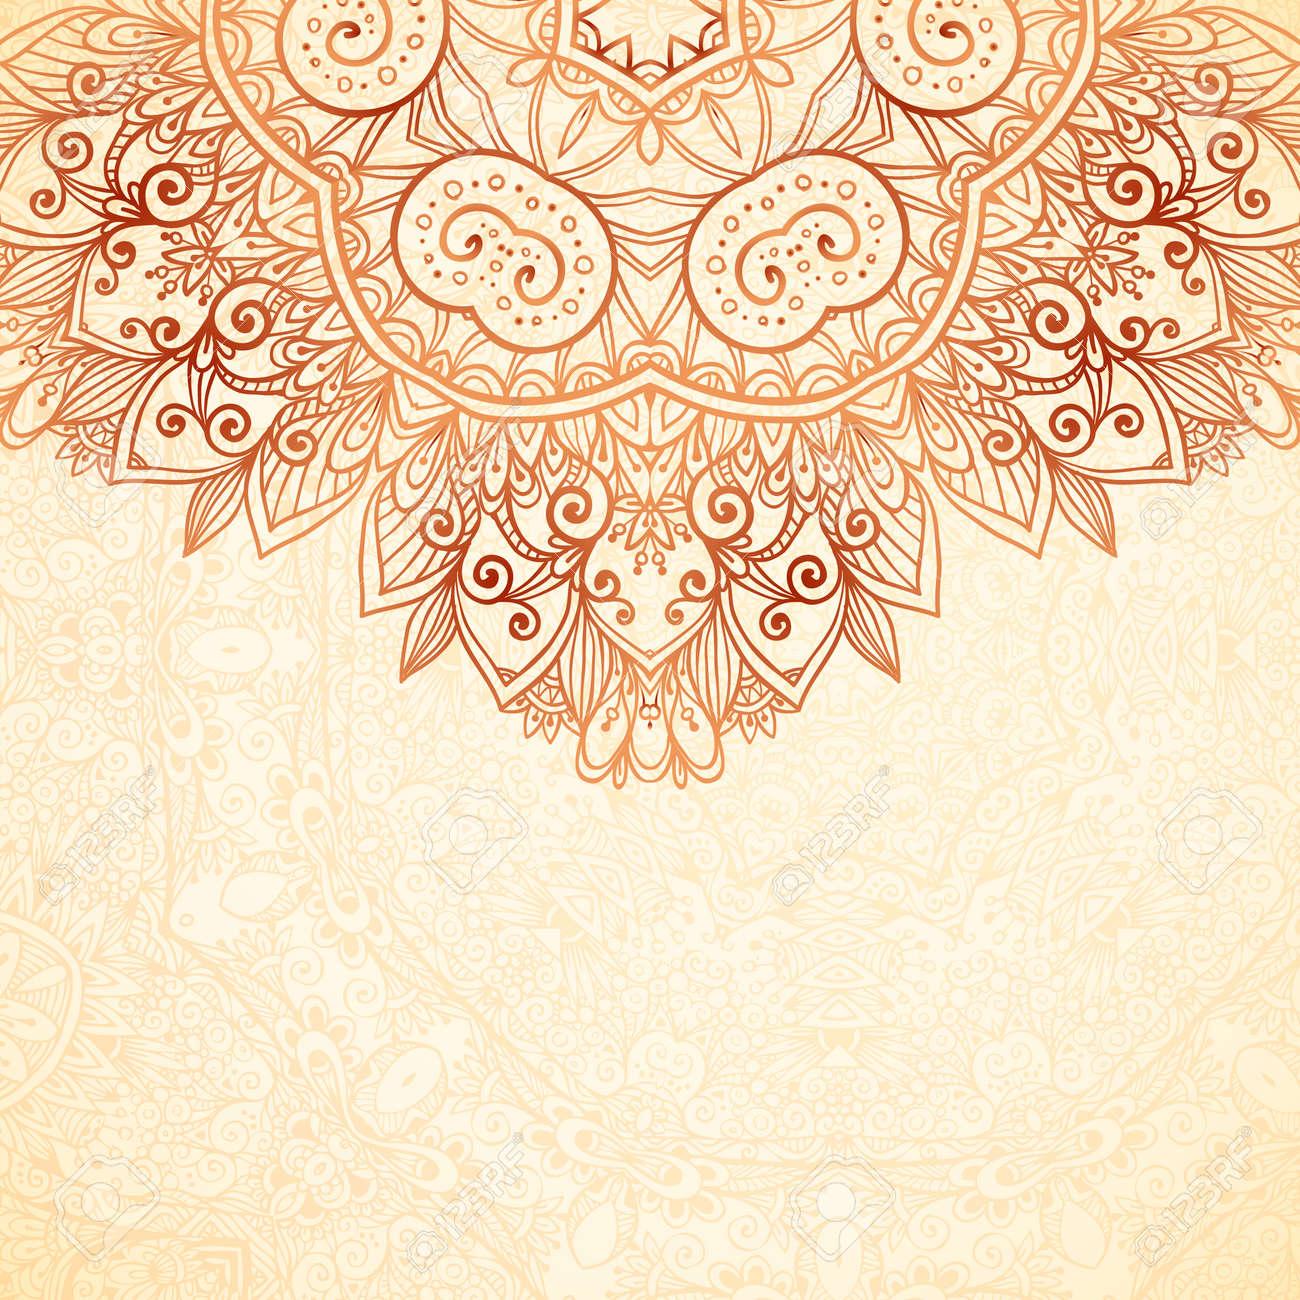 Ornate vintage vector background in mehndi style royalty free stock - Ornate Vintage Background In Mehndi Style Stock Vector 30312408